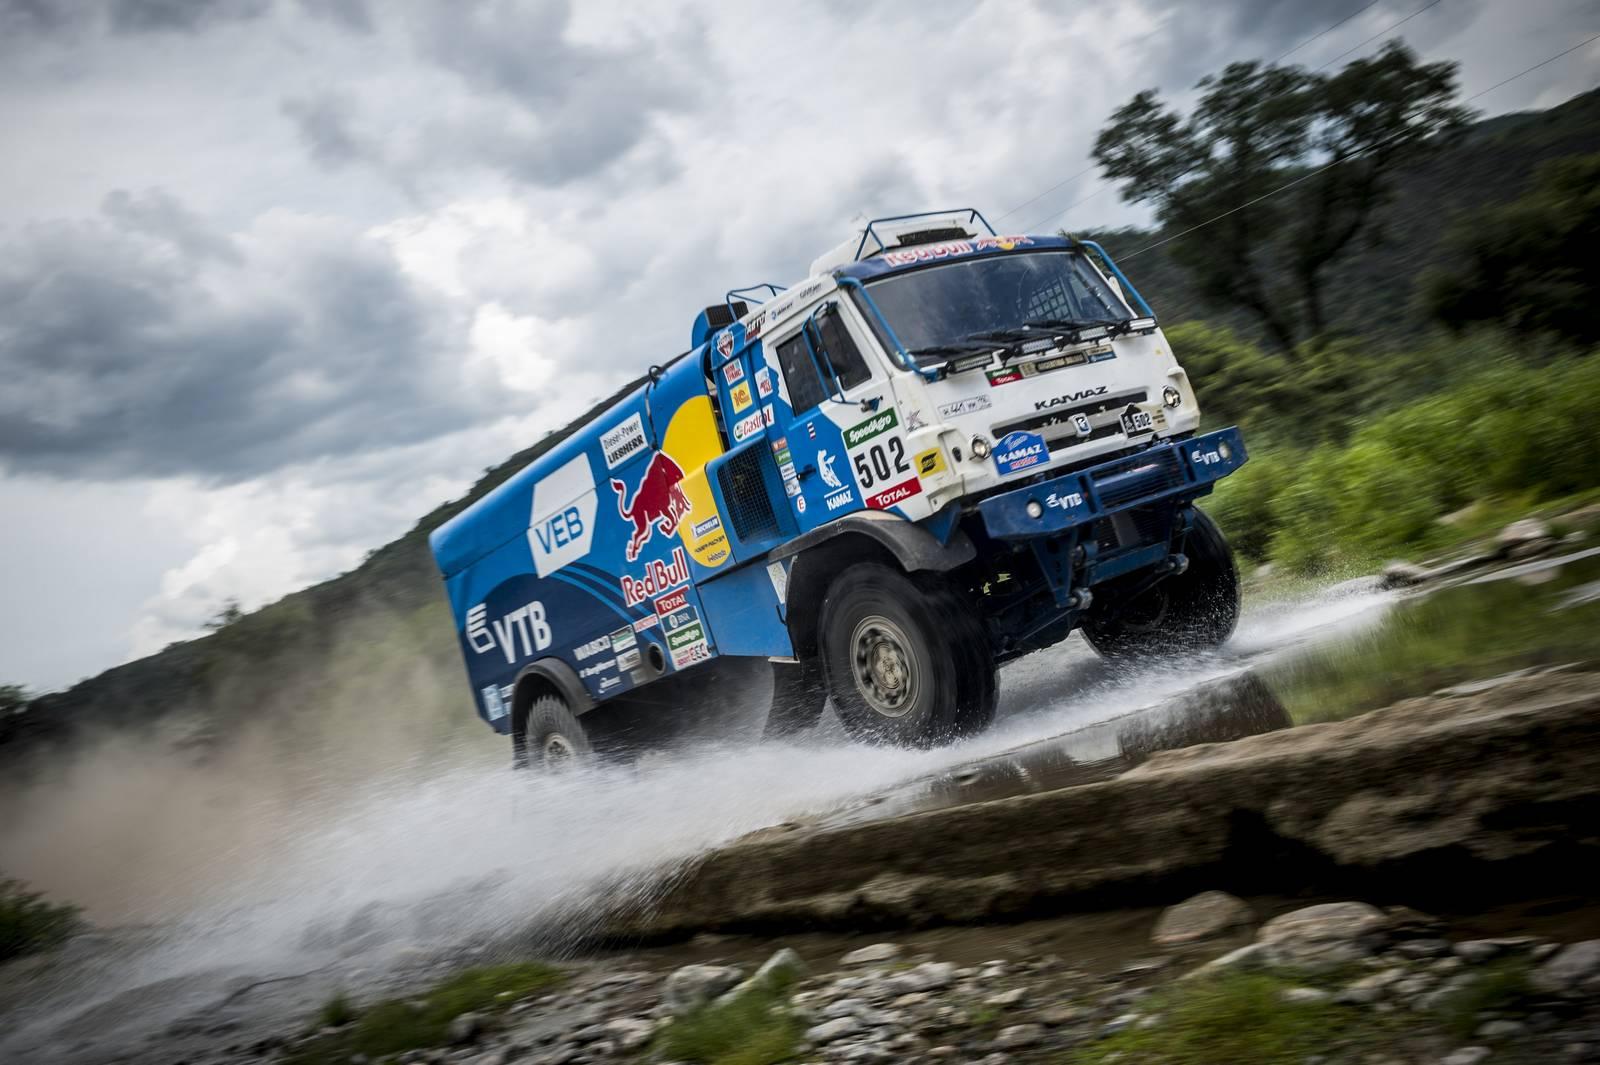 Dakar Rally 2016 Mini Toyota Victory Fight Thrills In